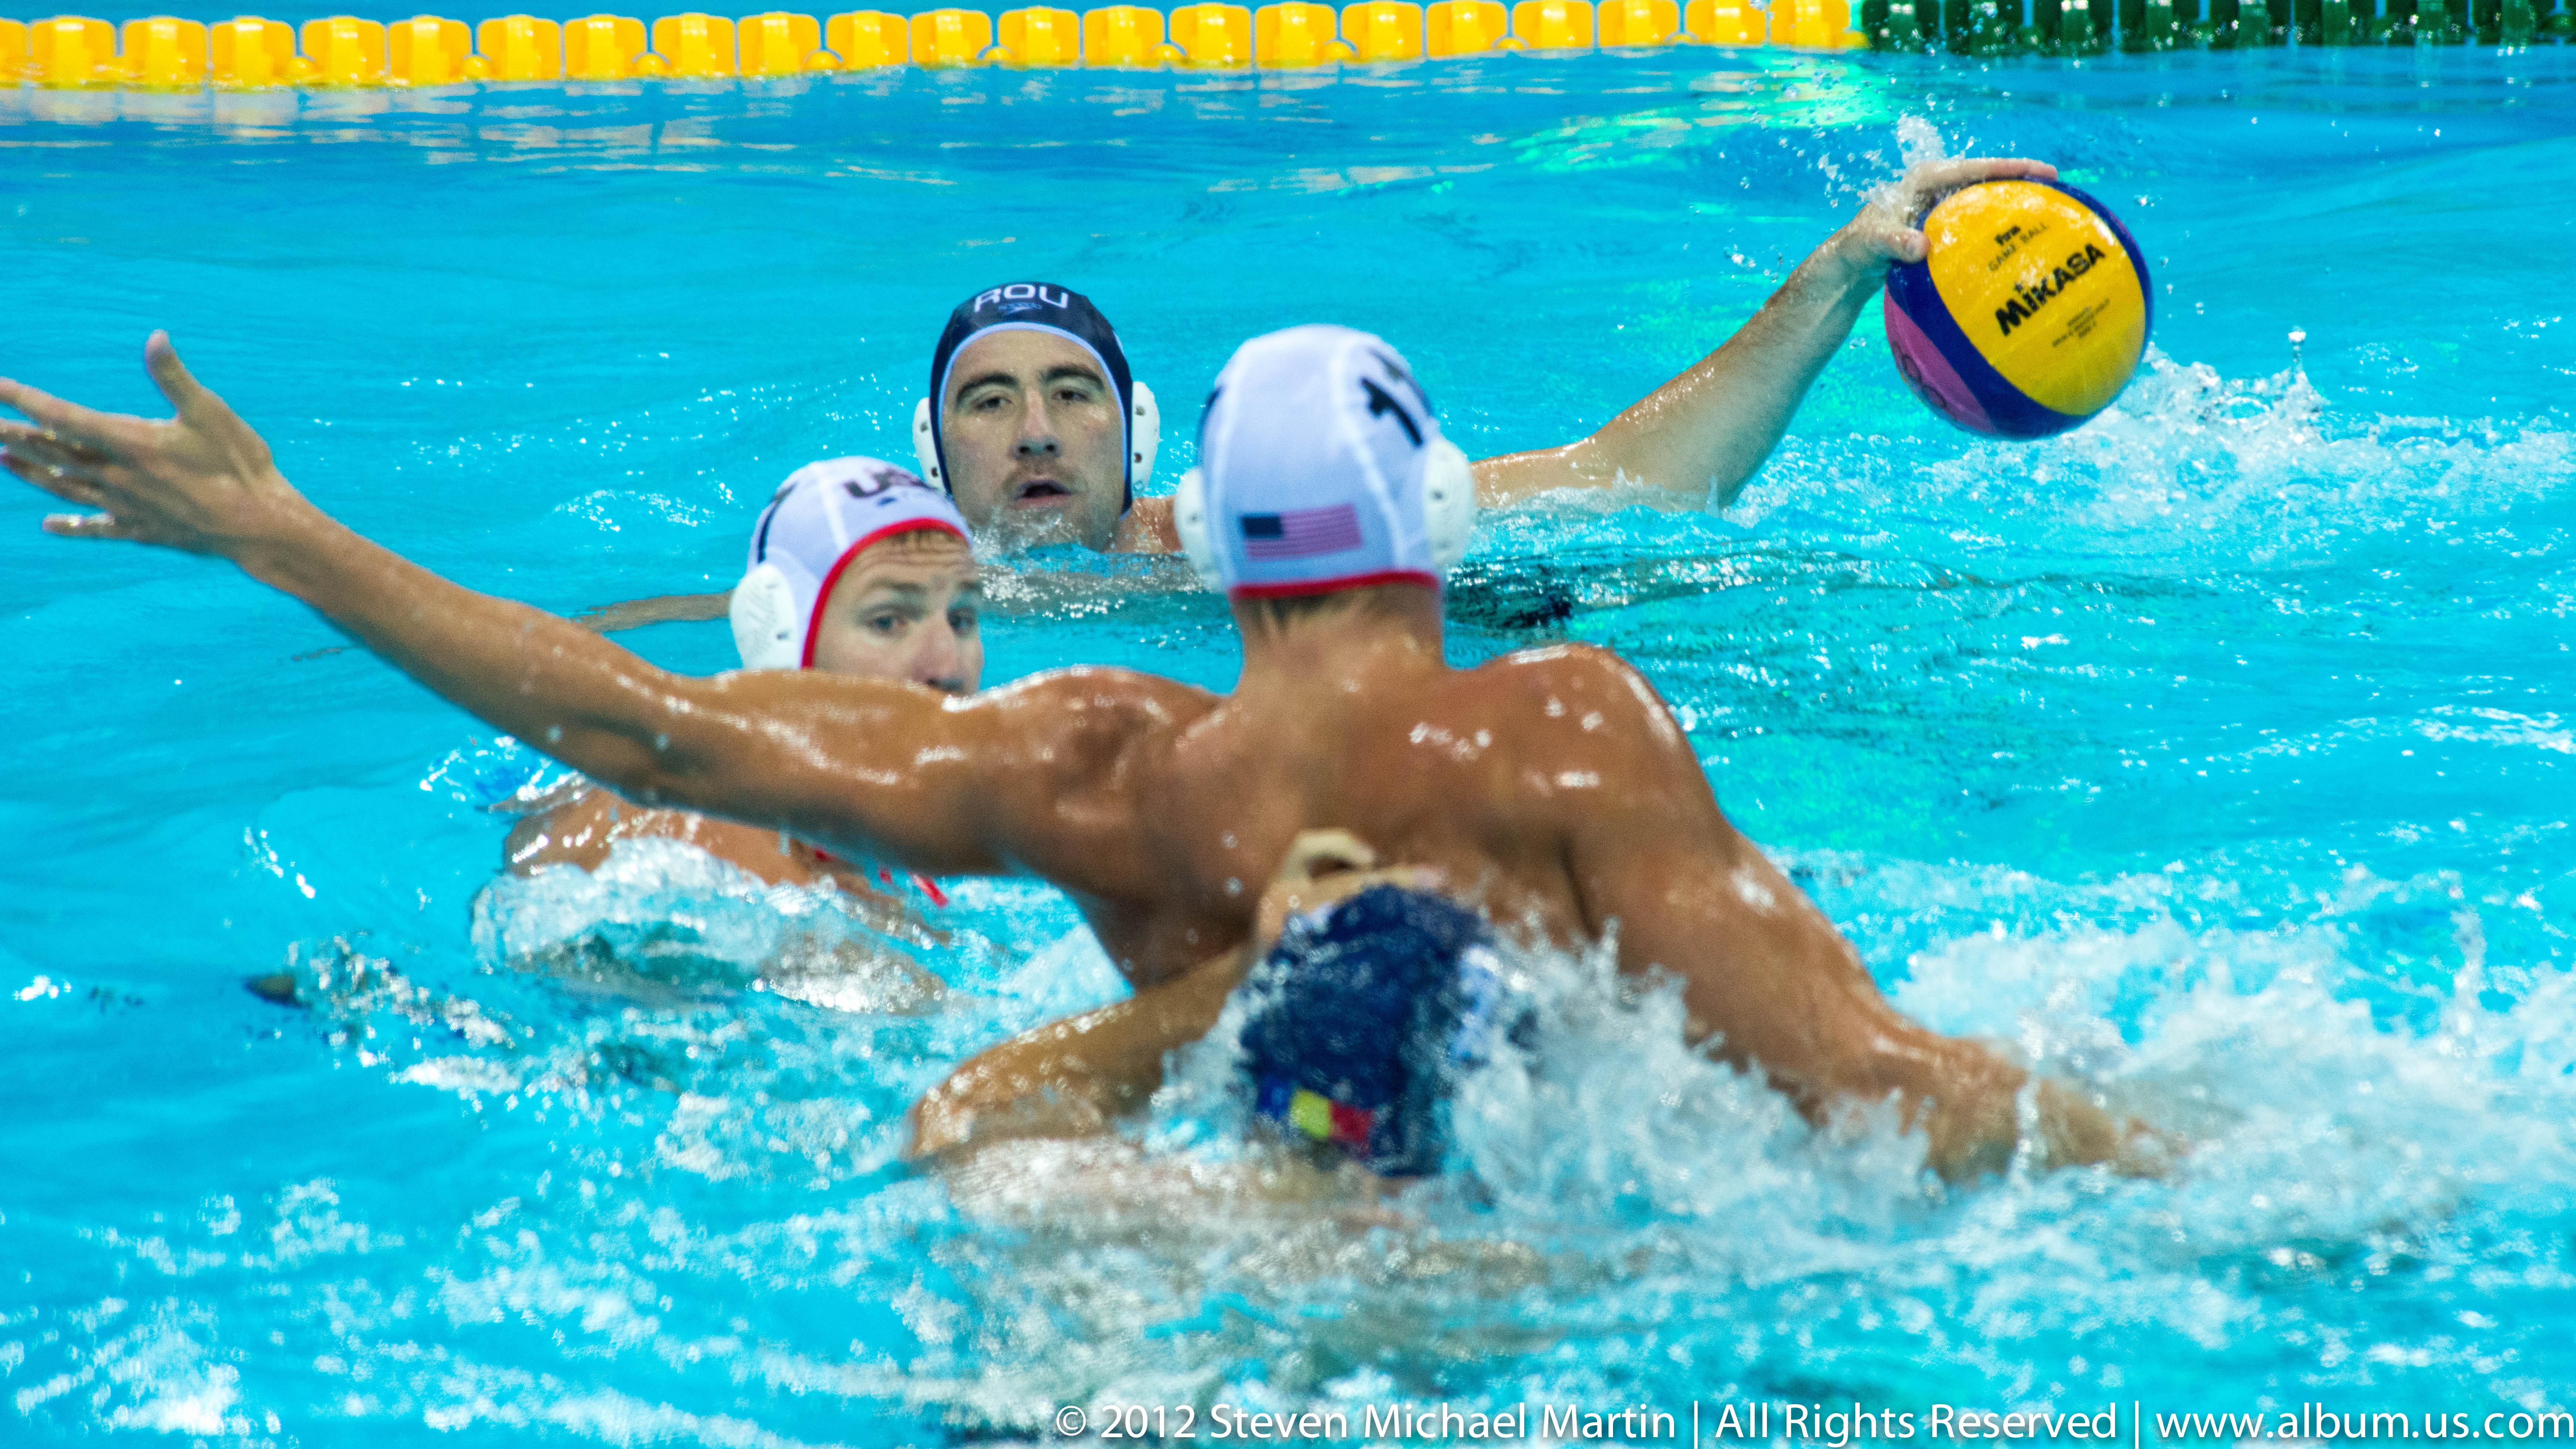 SMartin_2012 Olympics Mens Water Polo_5224051